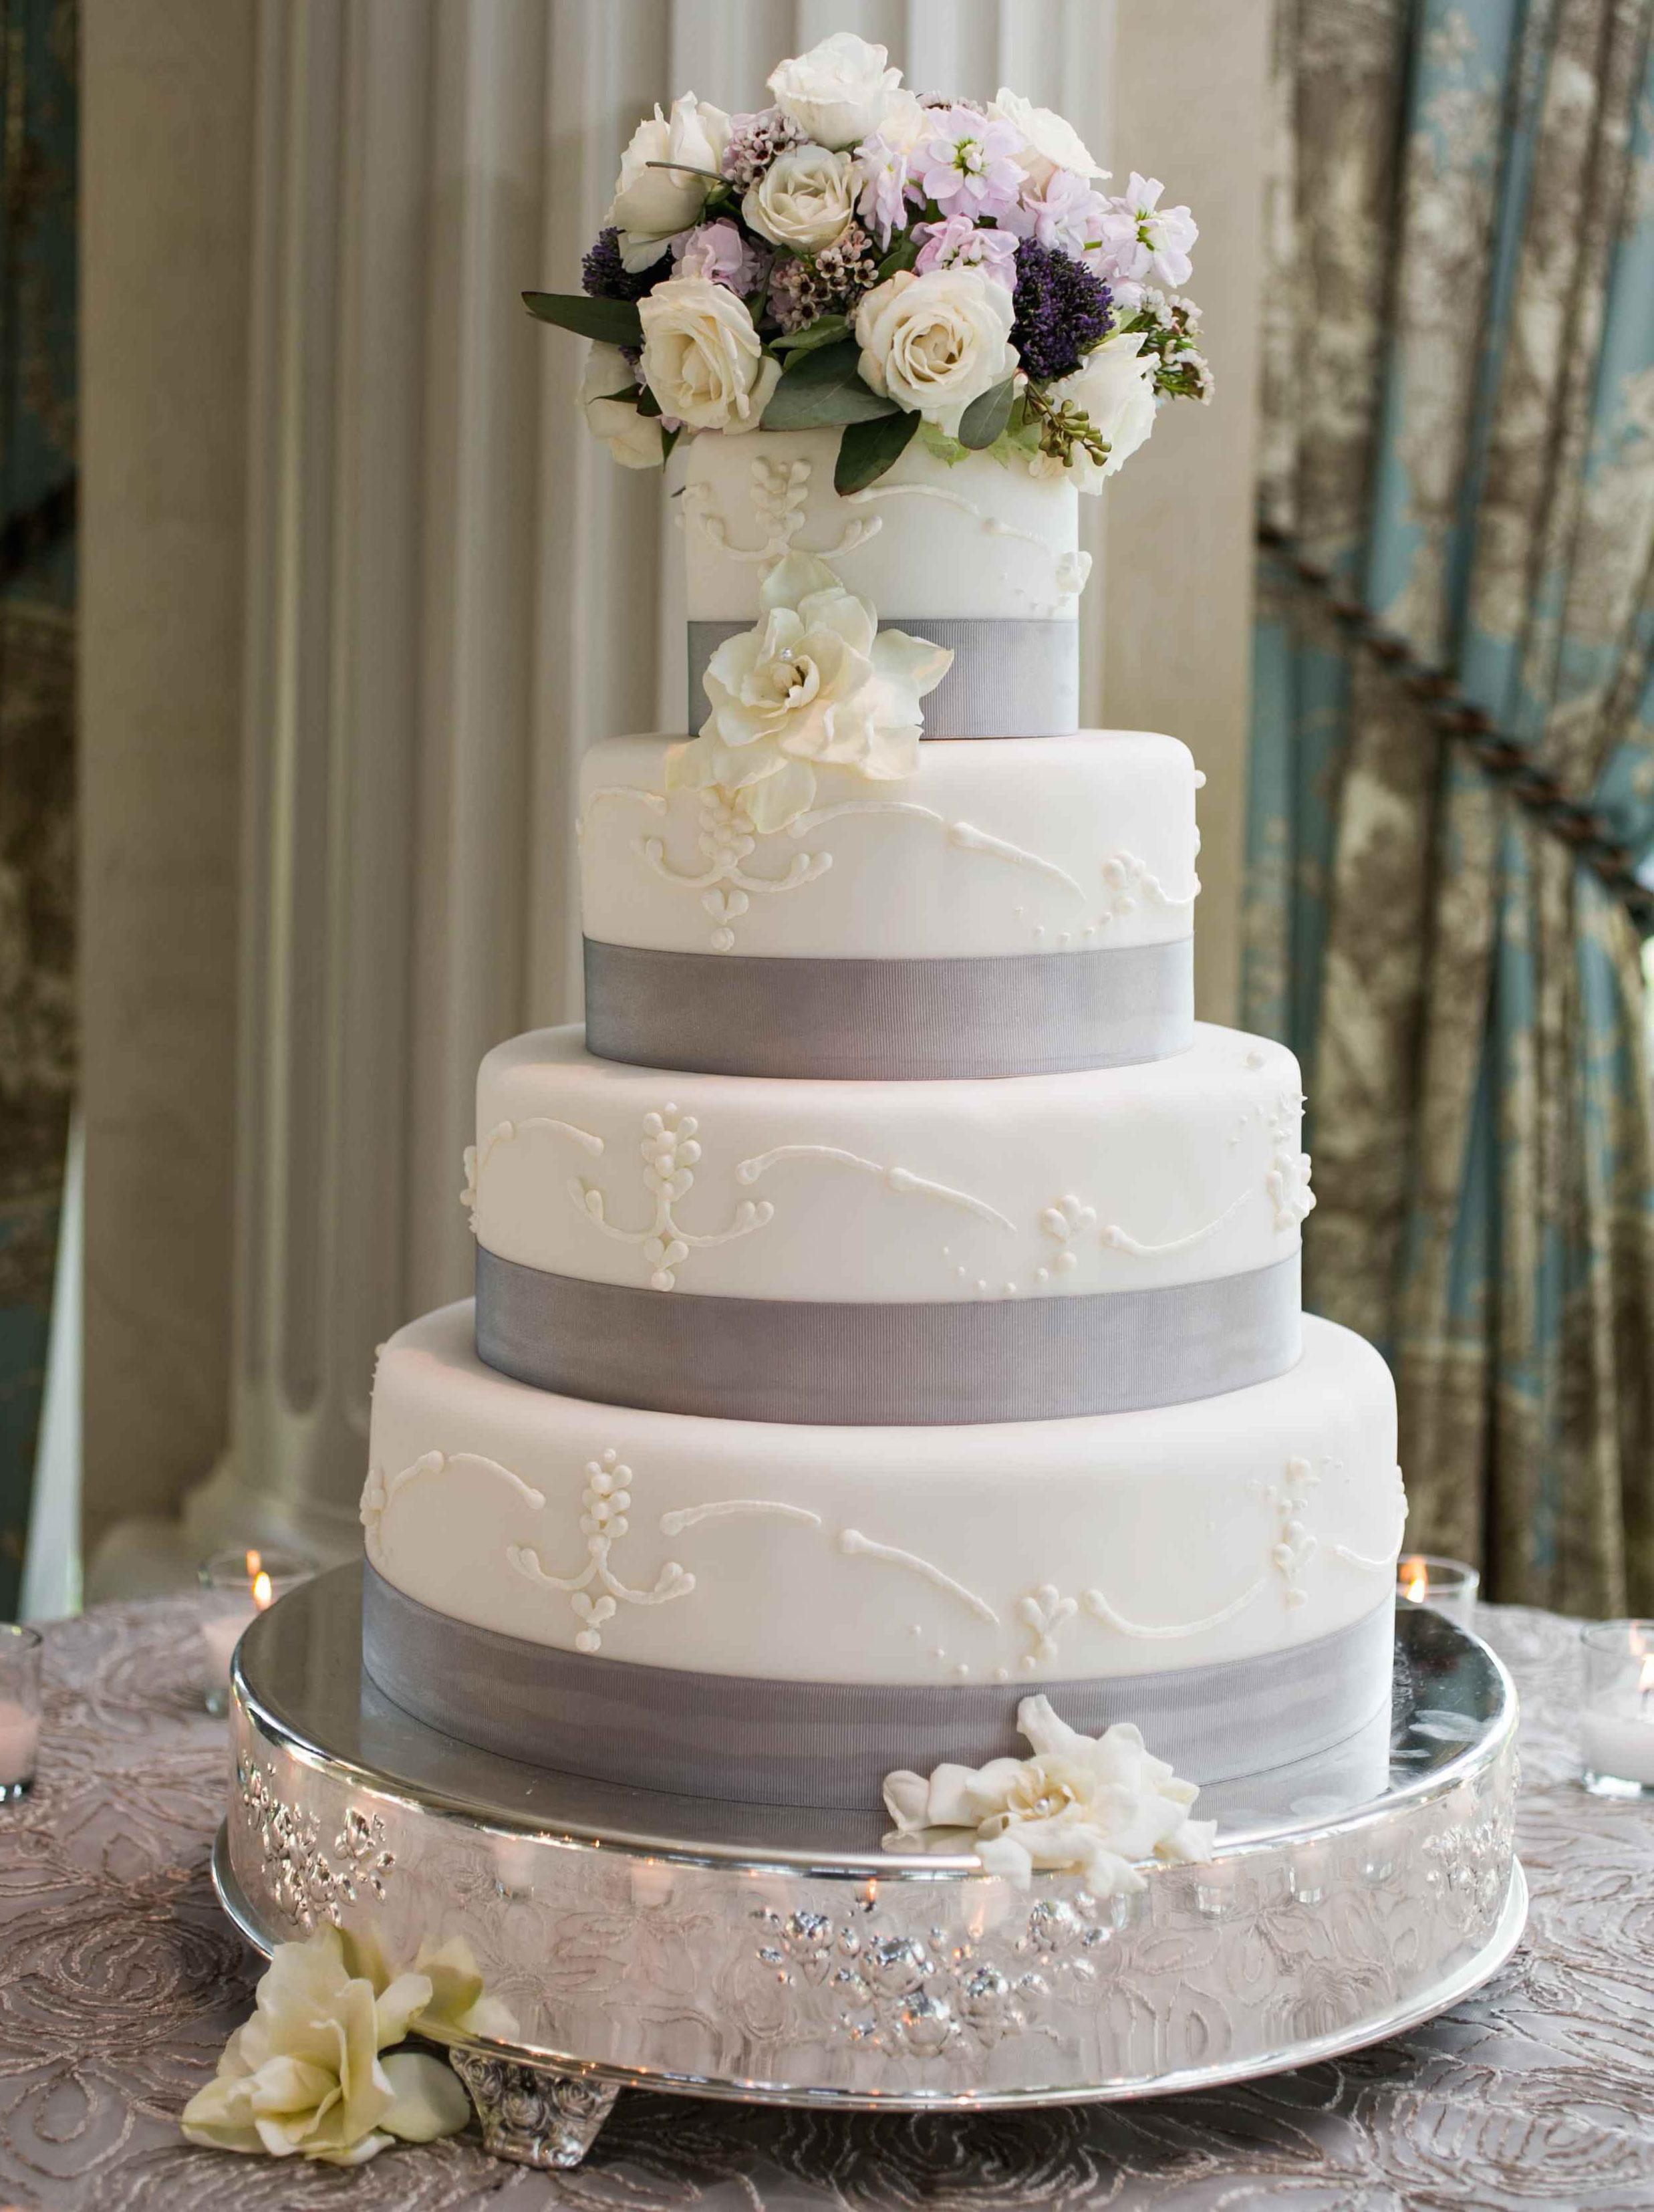 Wedding cake with grey ribbon details